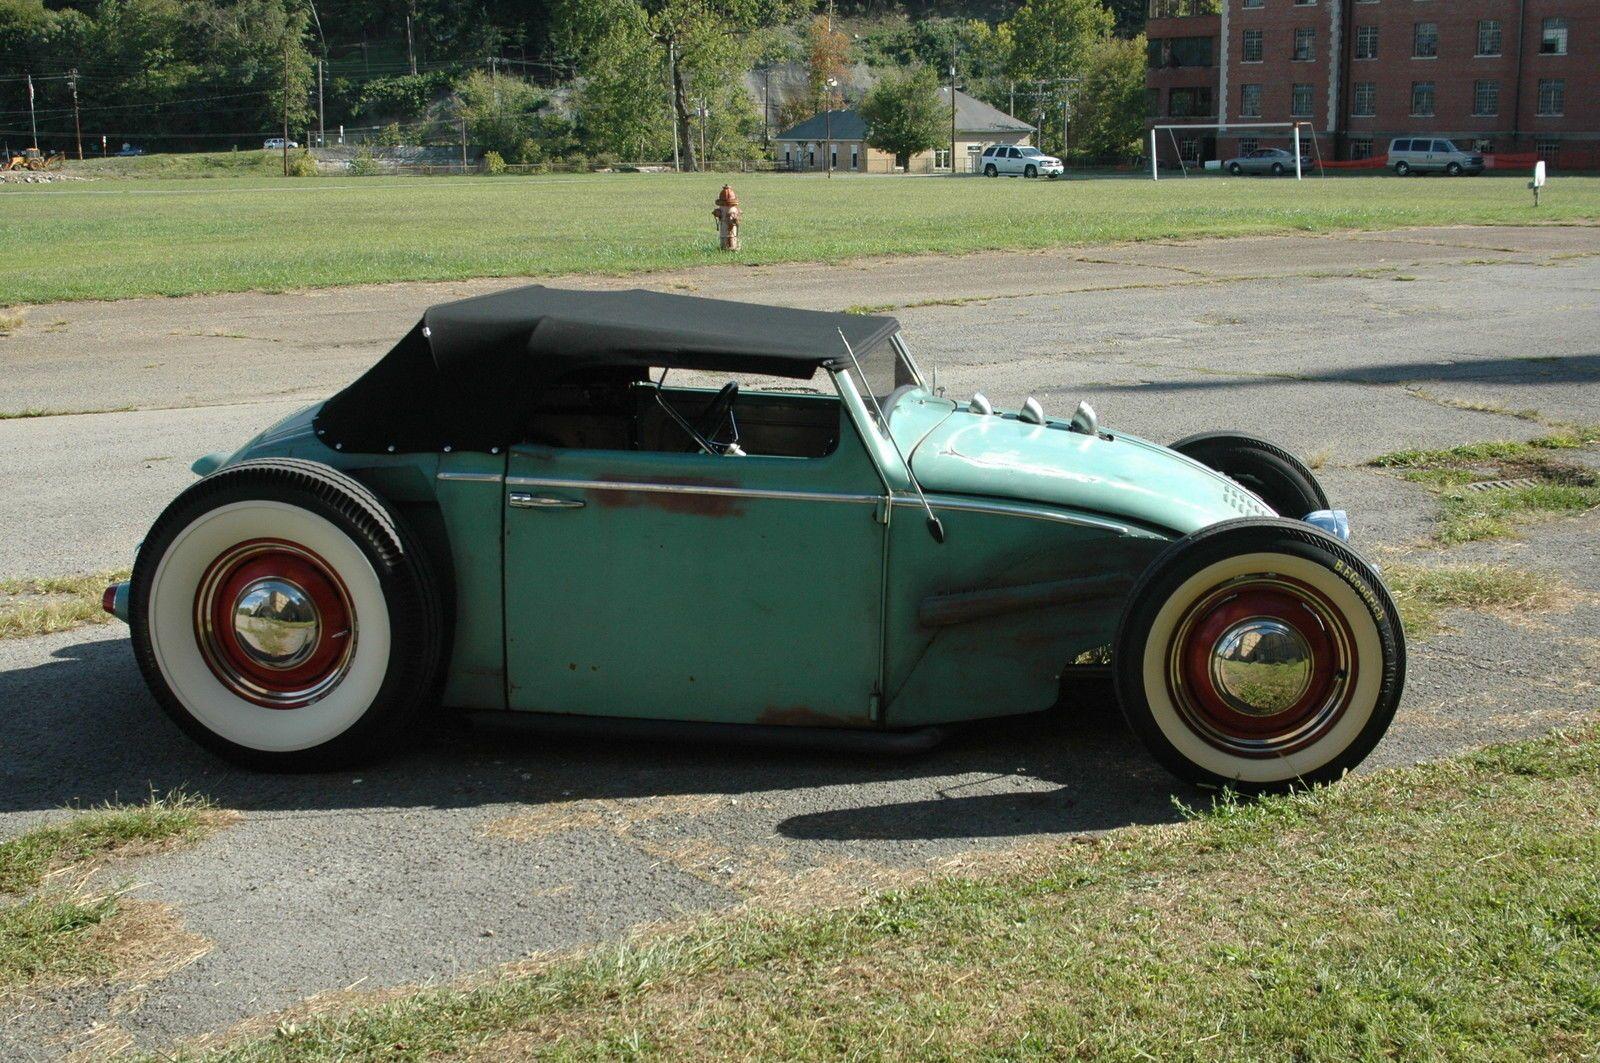 Old VW Beetle Rat rod... that Audi TT looking chop top gives it s ...